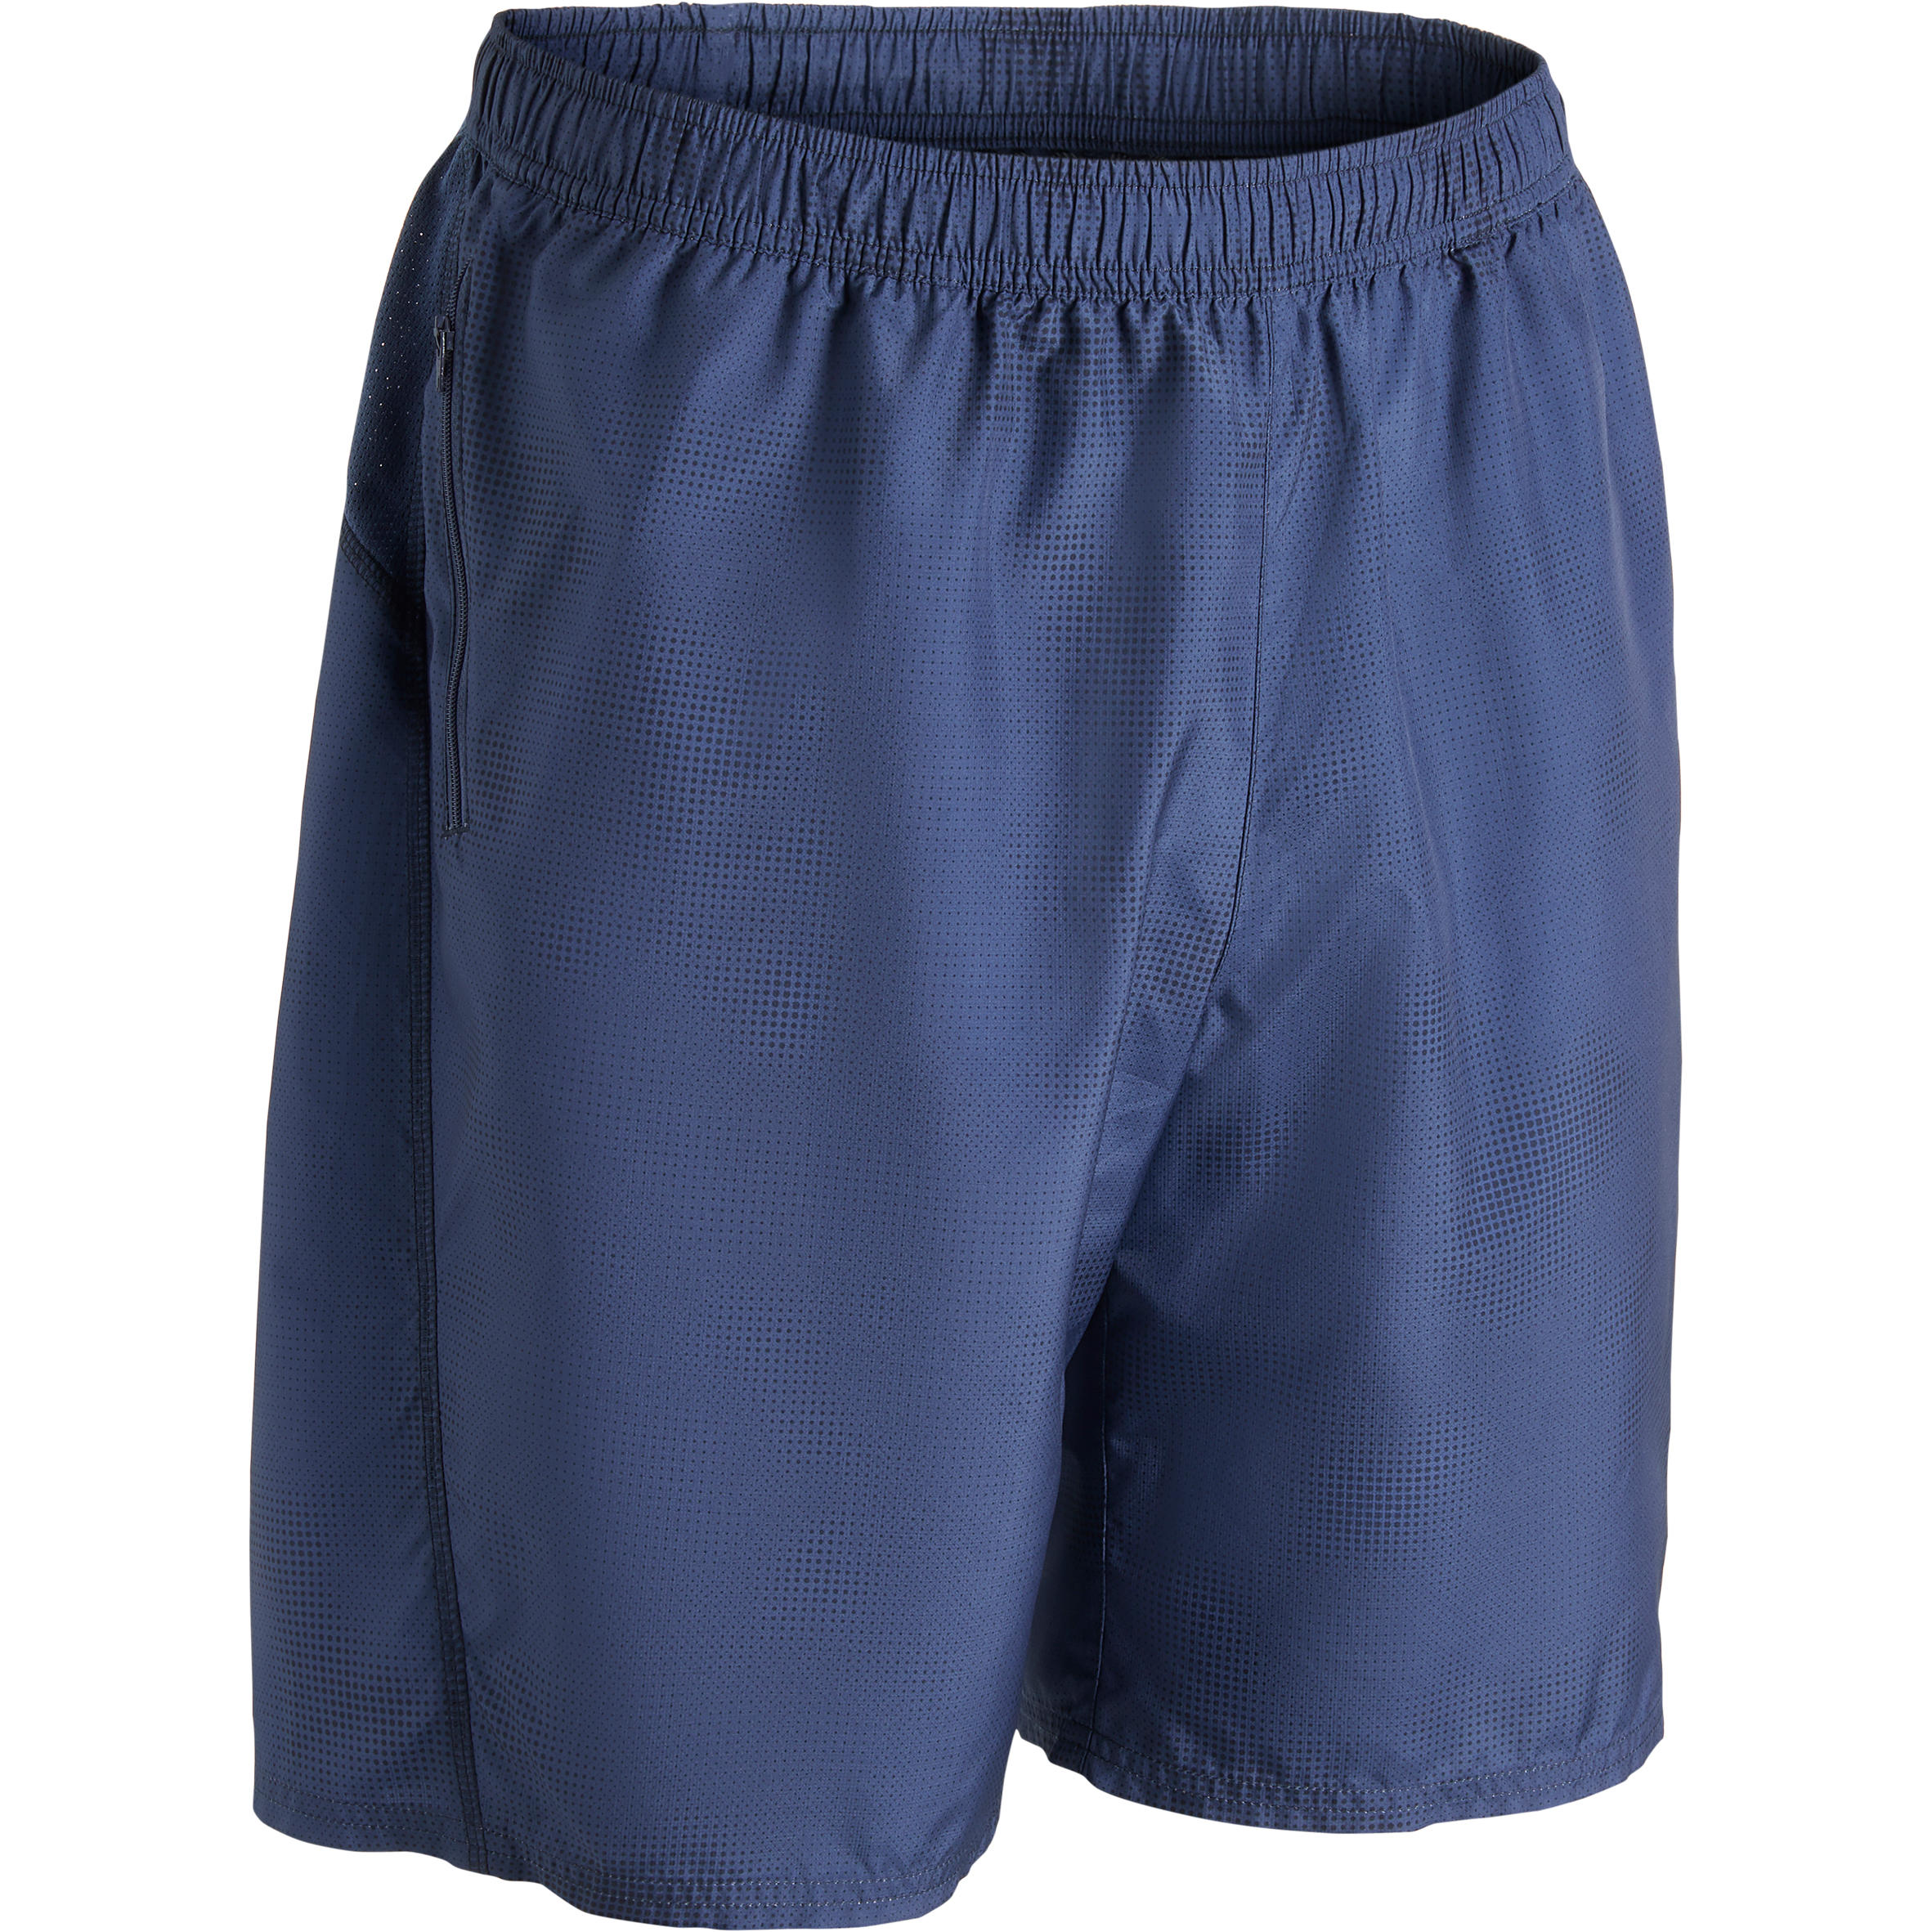 FST120 Fitness Cardio Shorts - Grey